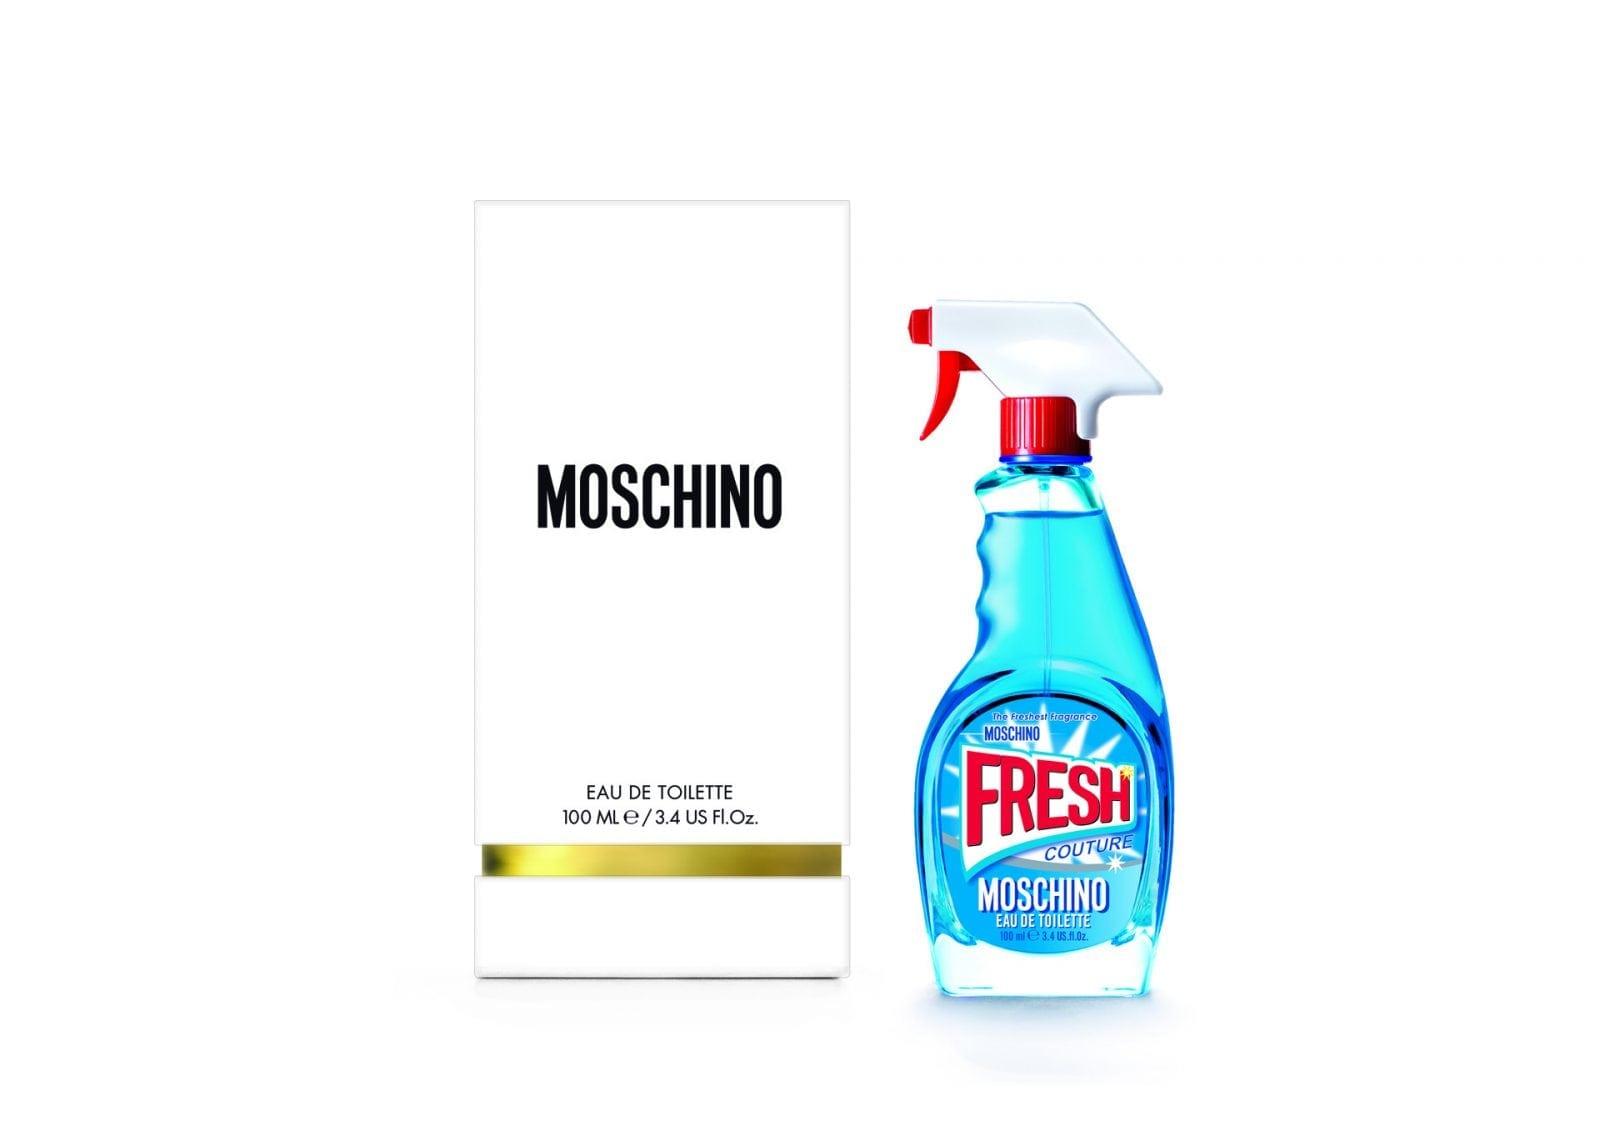 Moschino Fresh - Fresh Couture by Moschino